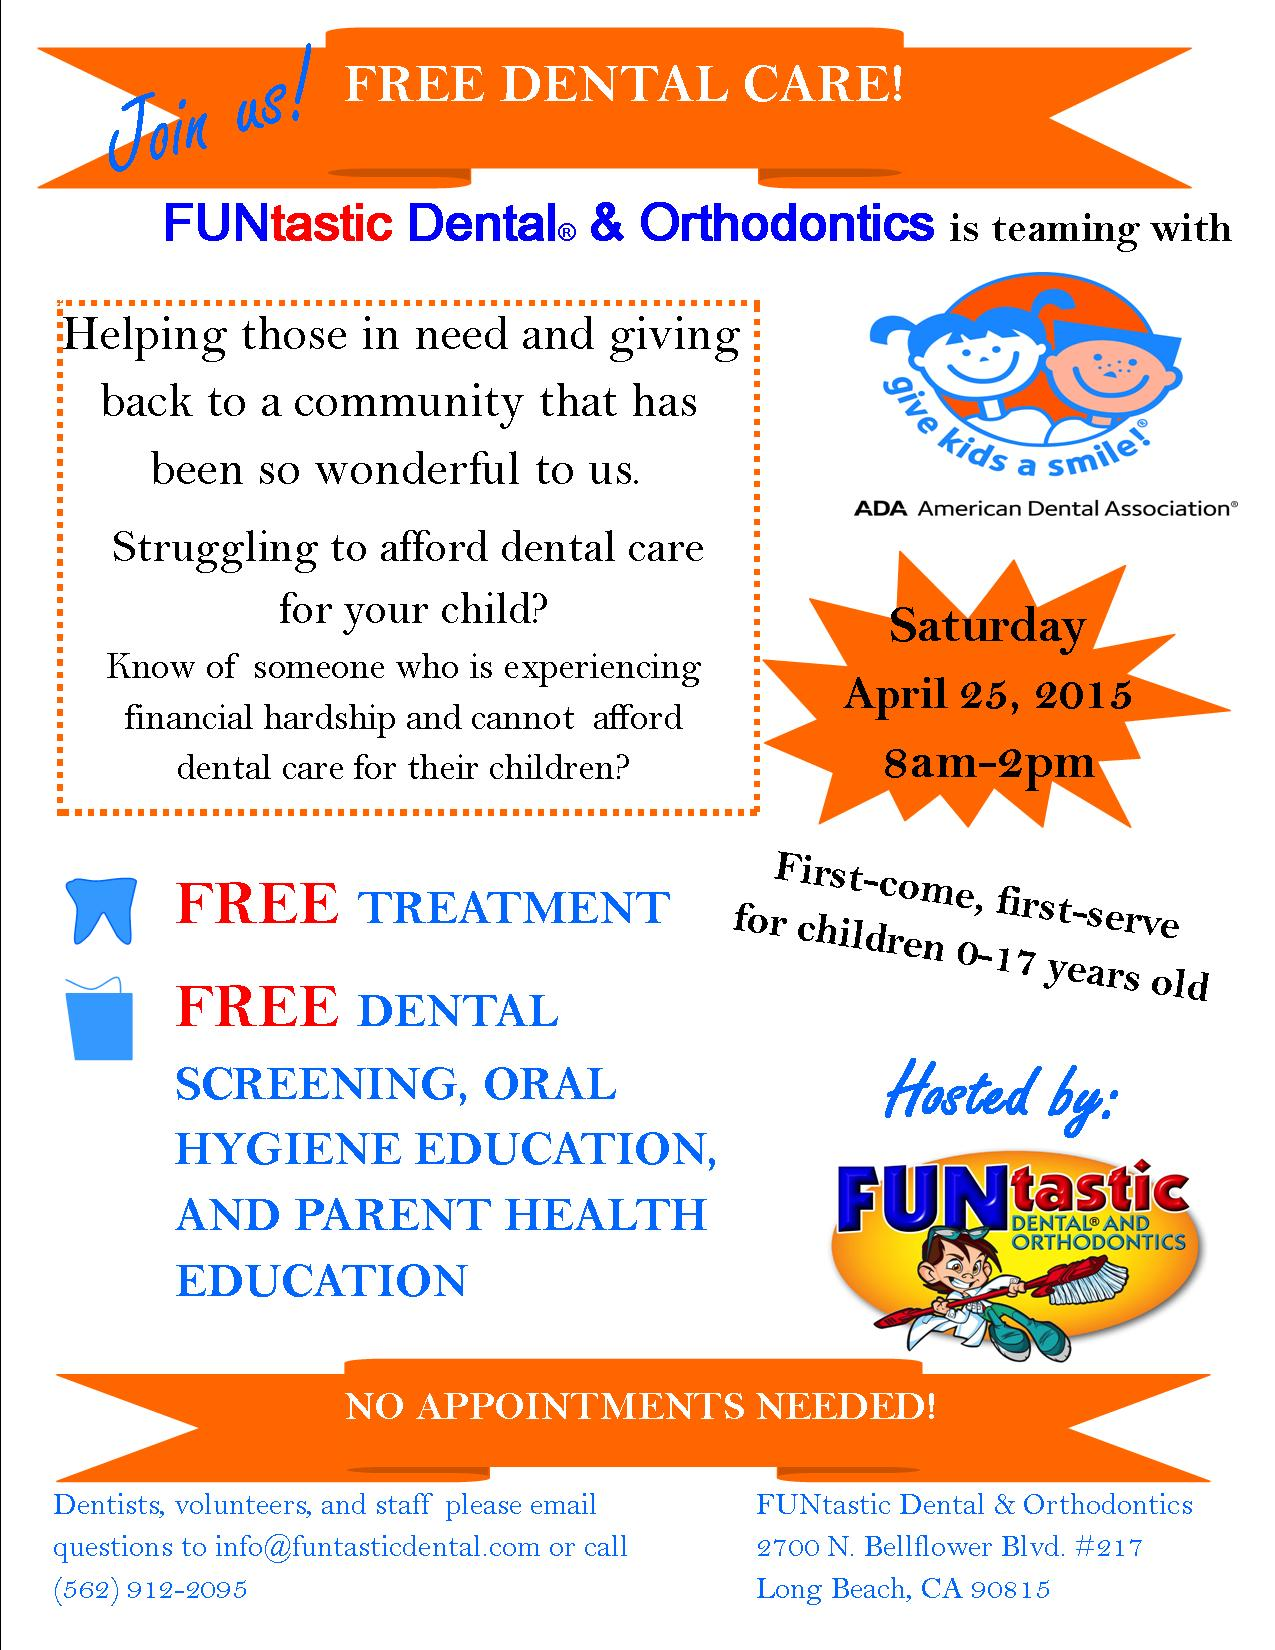 Long Beach Dental Care